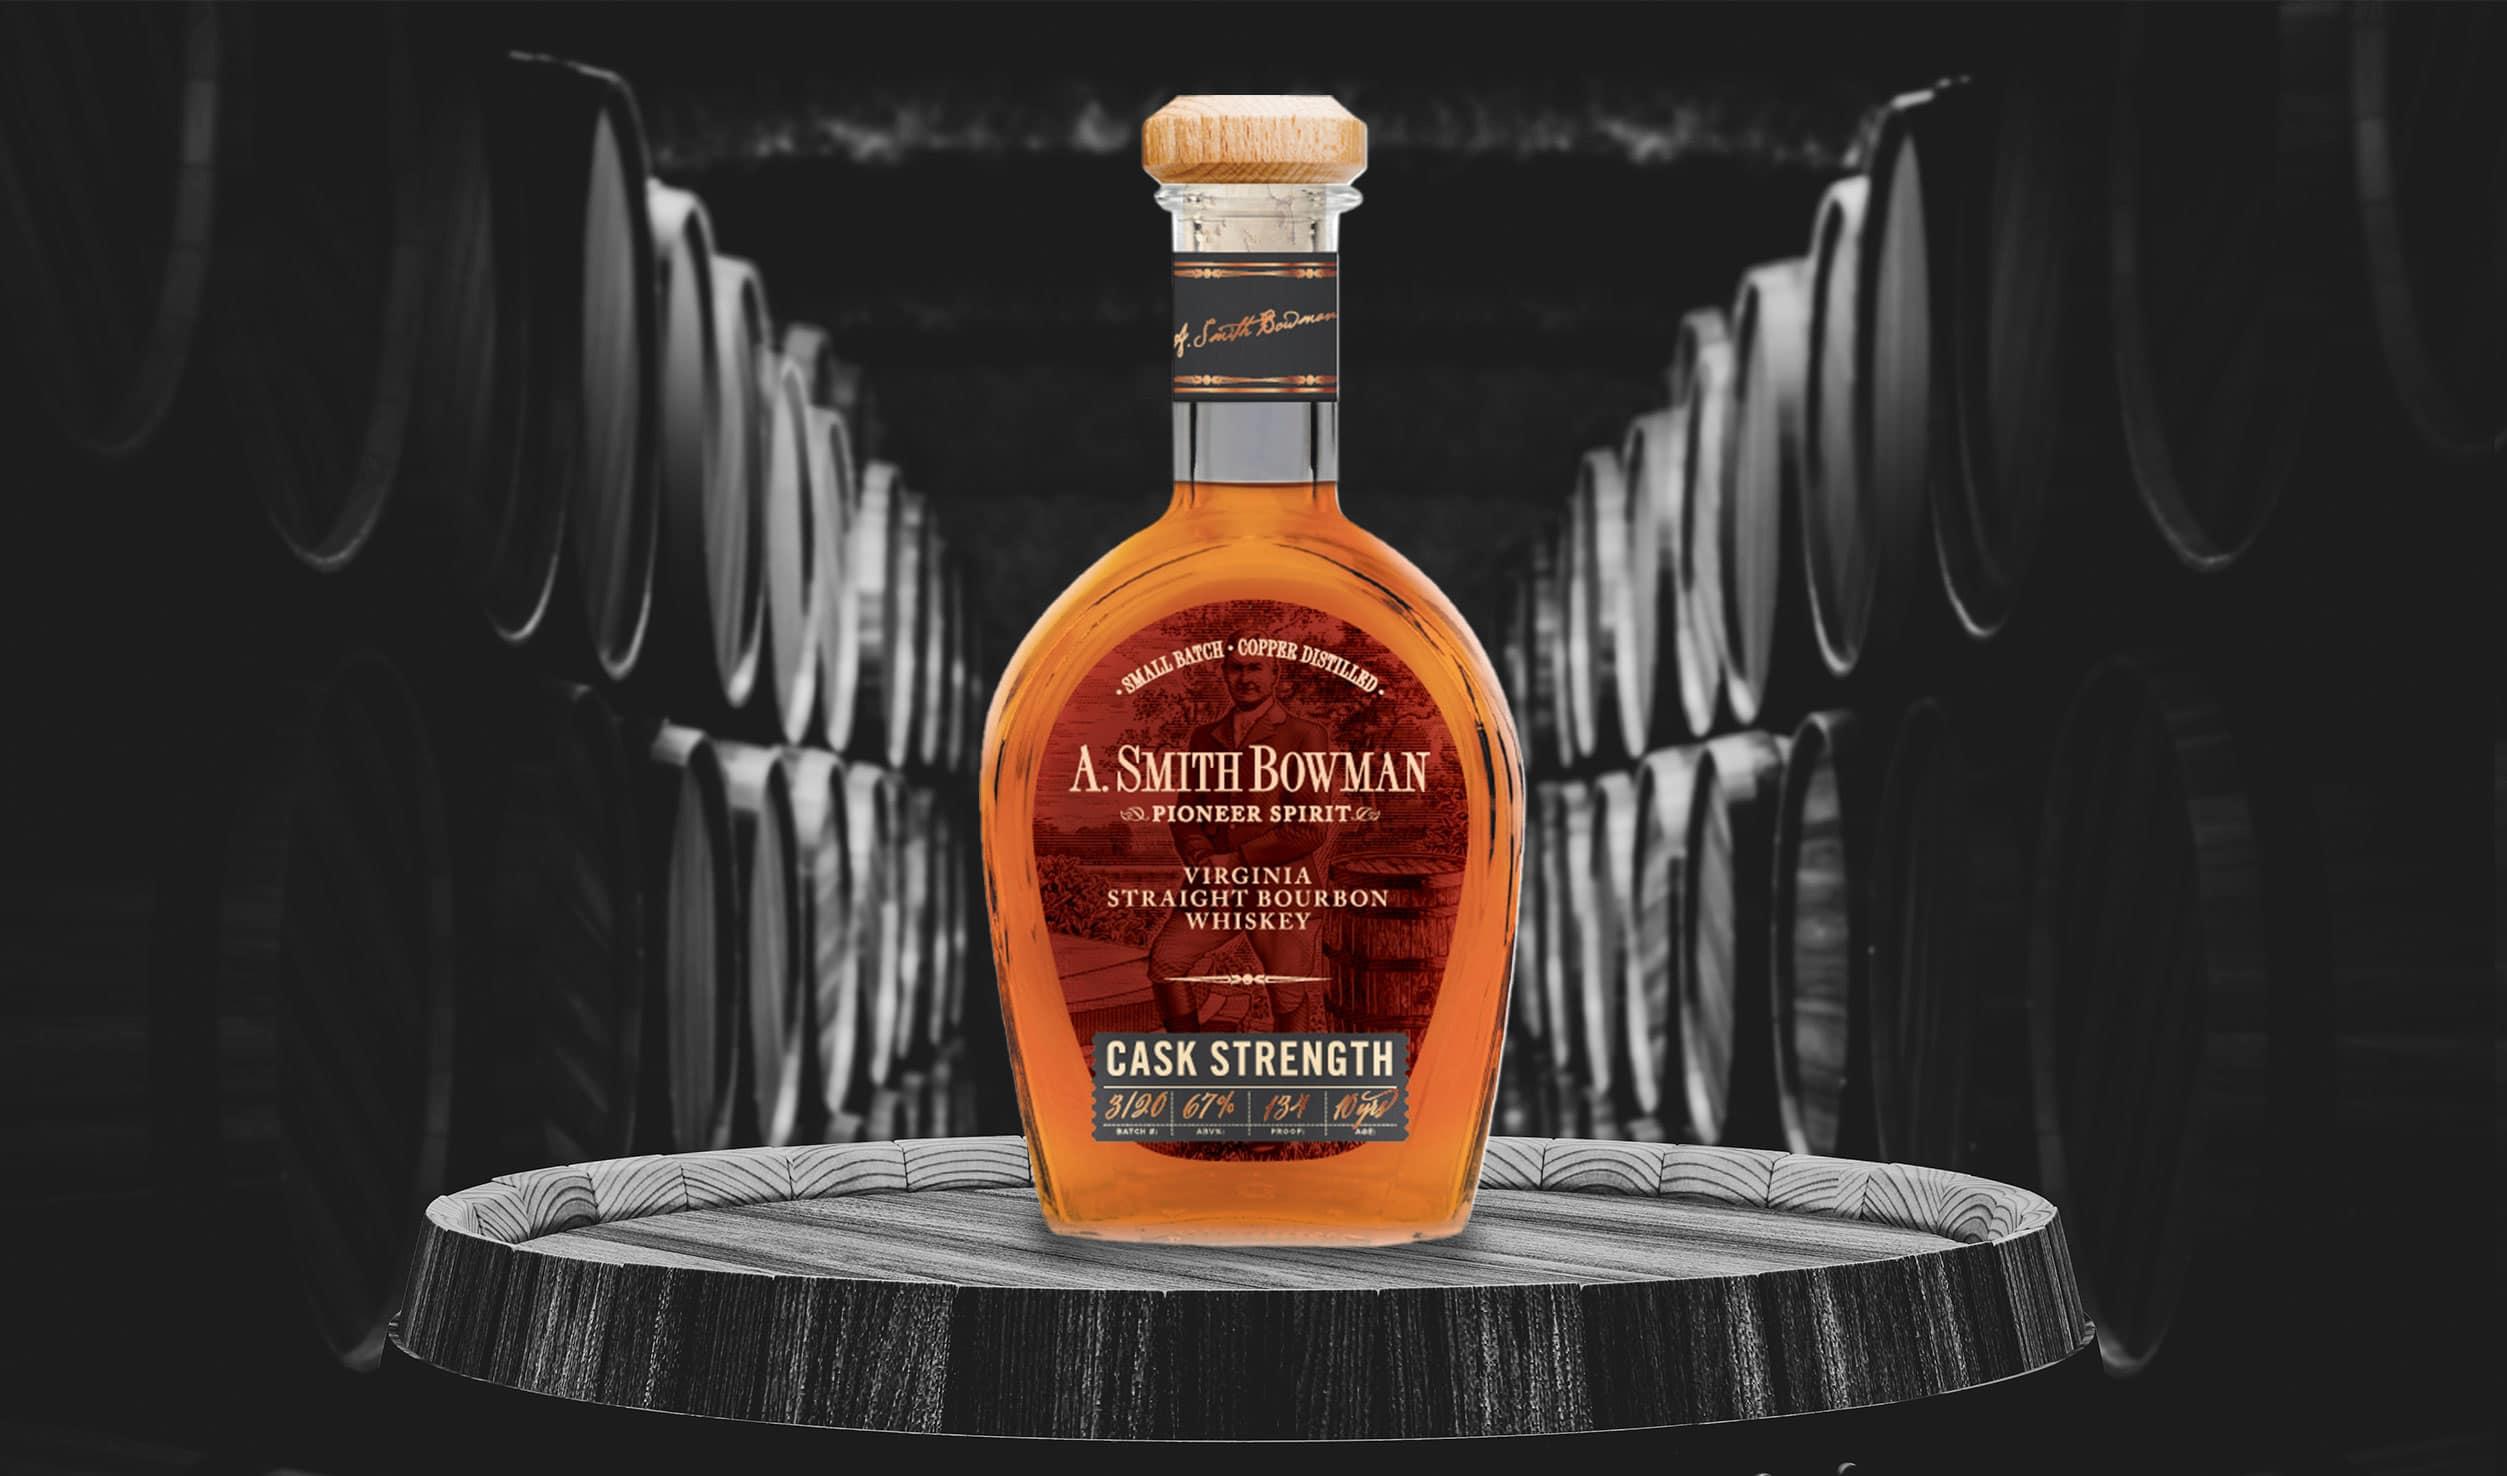 A.-Smith Bowman Distillery Cask Strength